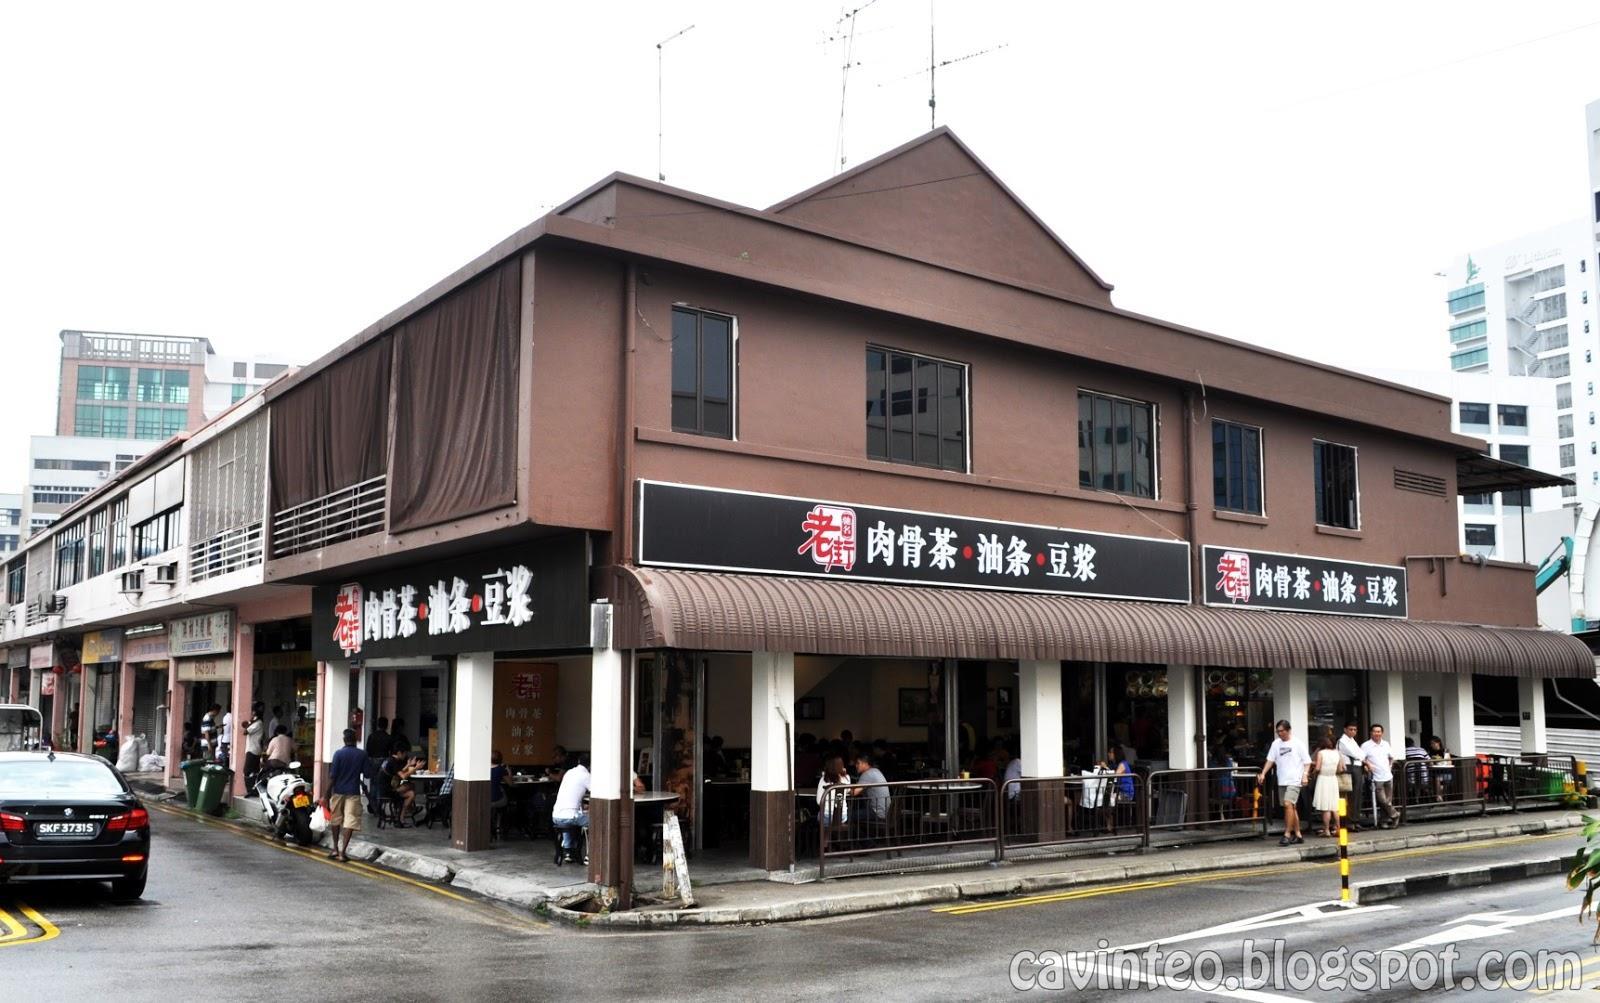 01 Old Street Bak Ku Teh [老街肉骨茶] @ 129 Upper Paya Lebar Road (Large).JPG